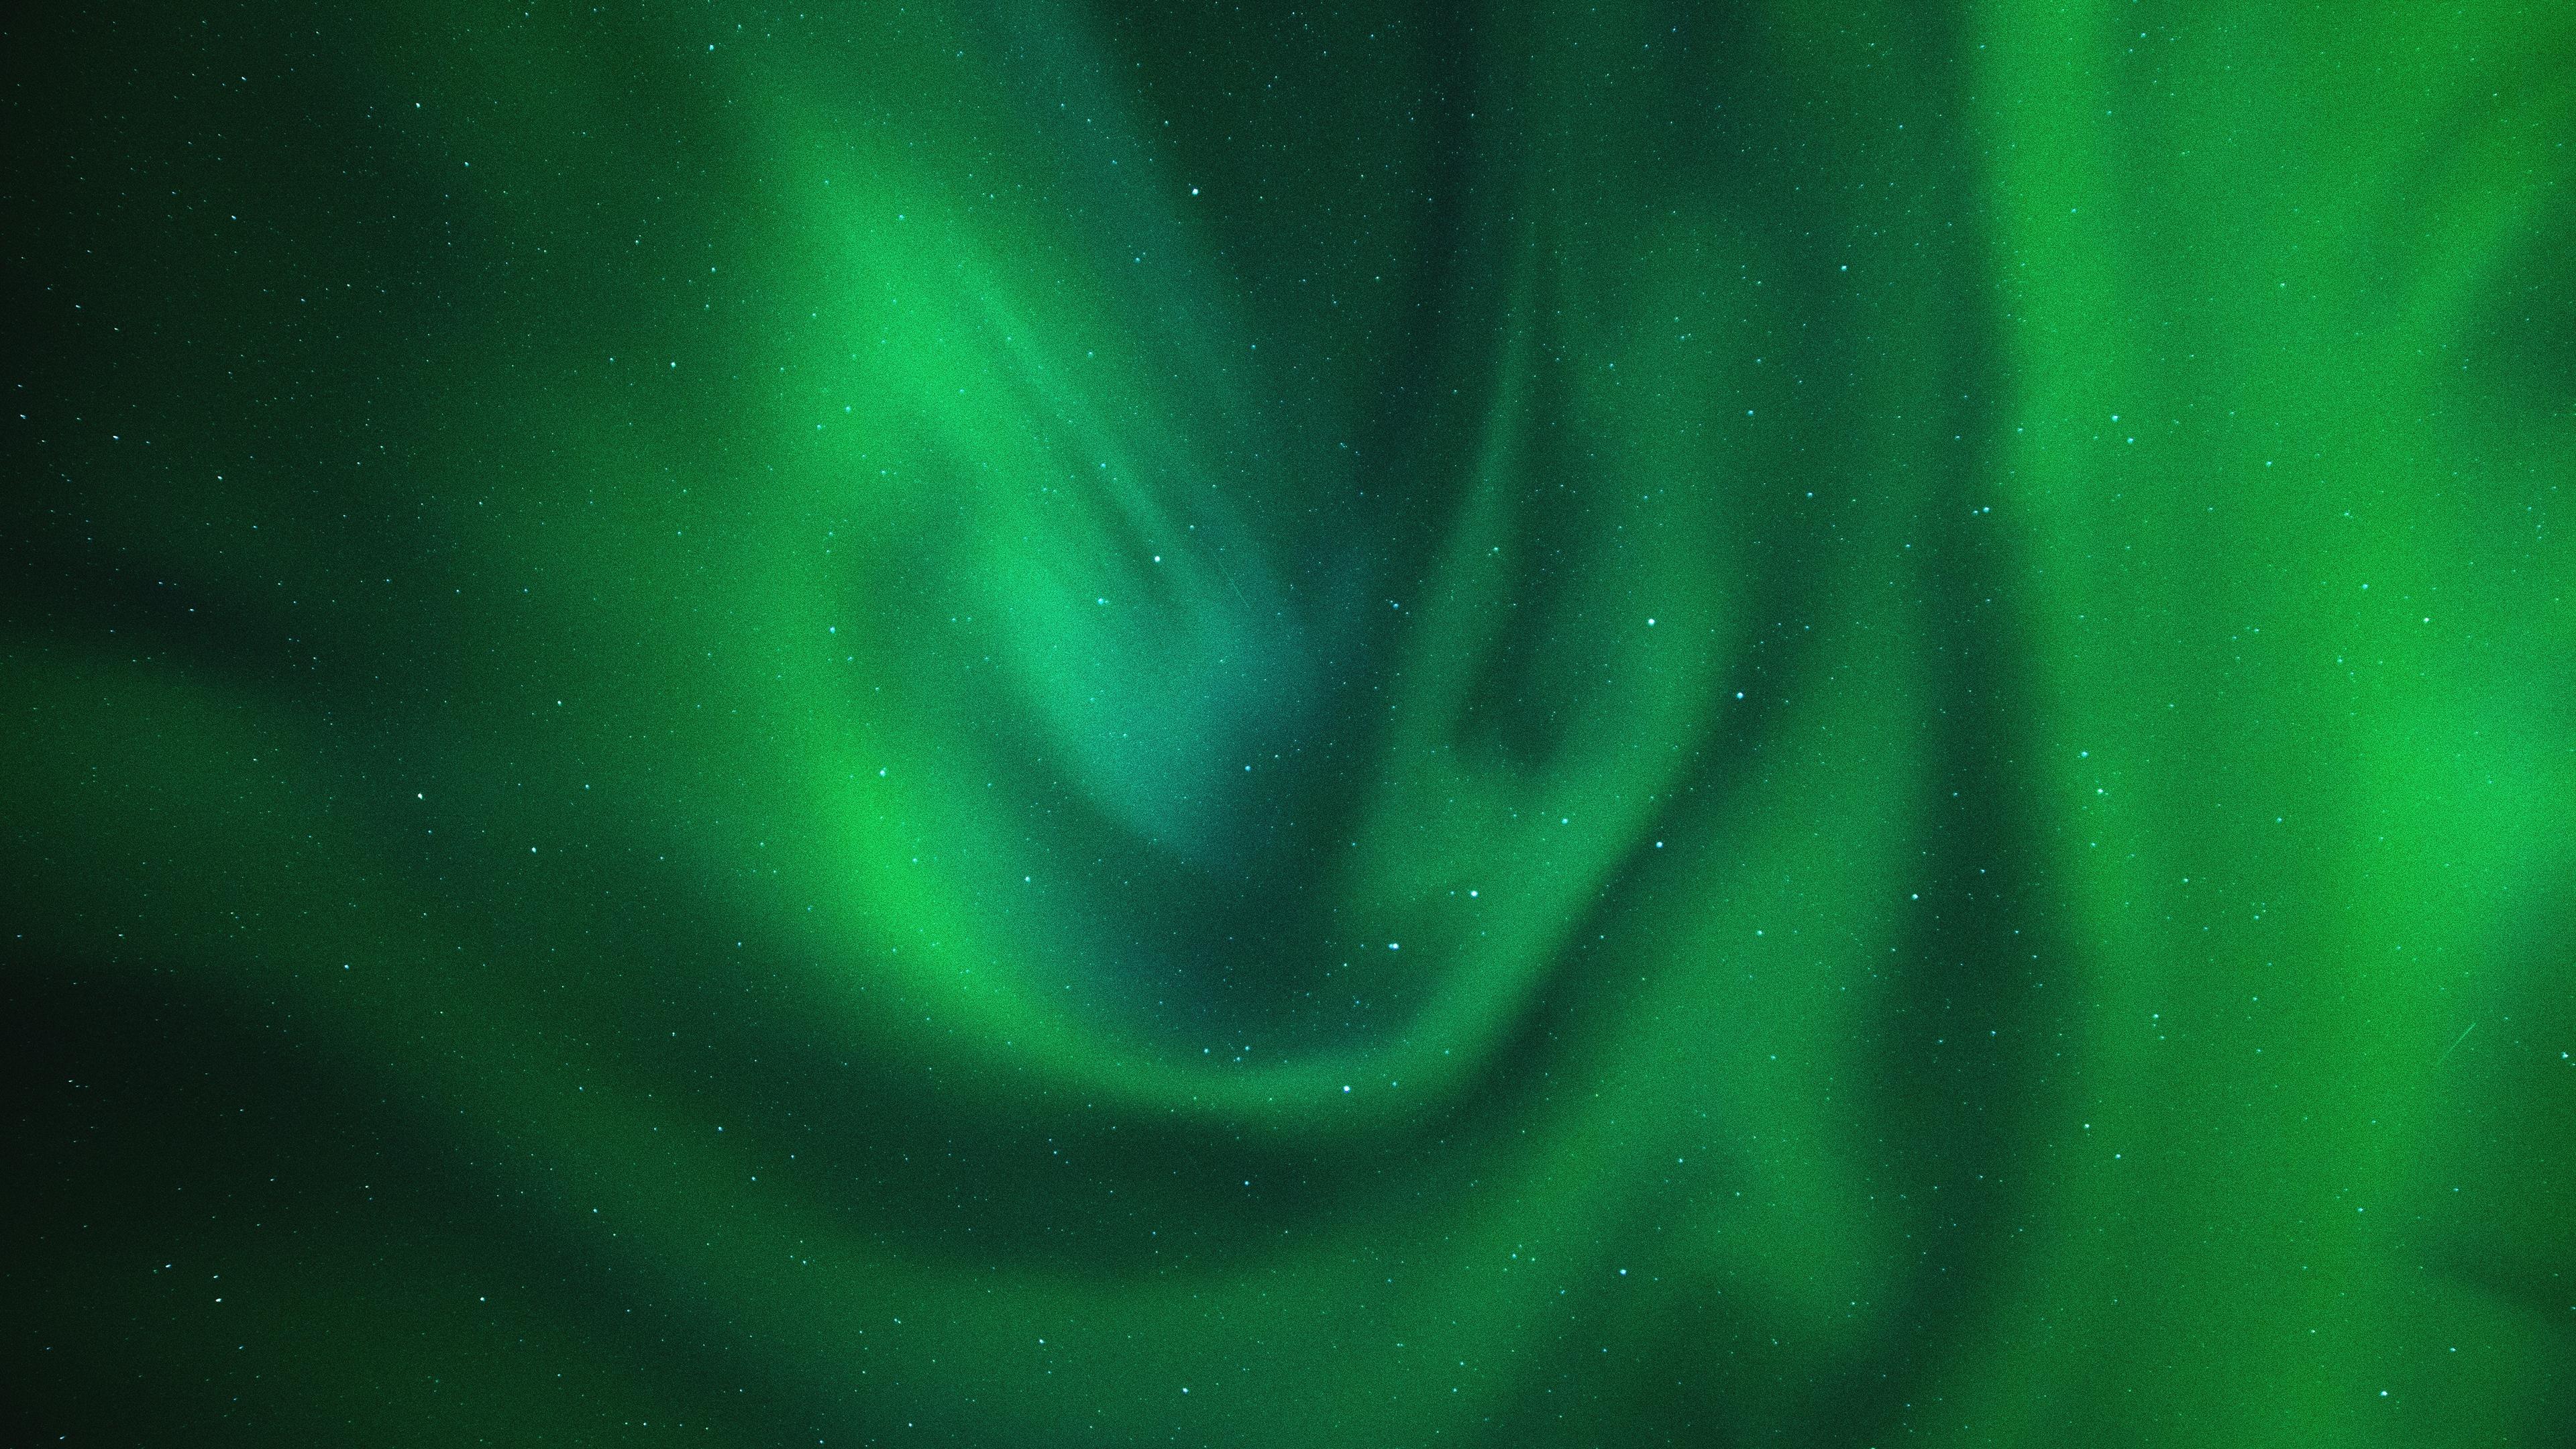 northern lights starry sky stars 4k 1536013915 - northern lights, starry sky, stars 4k - Stars, starry sky, northern lights